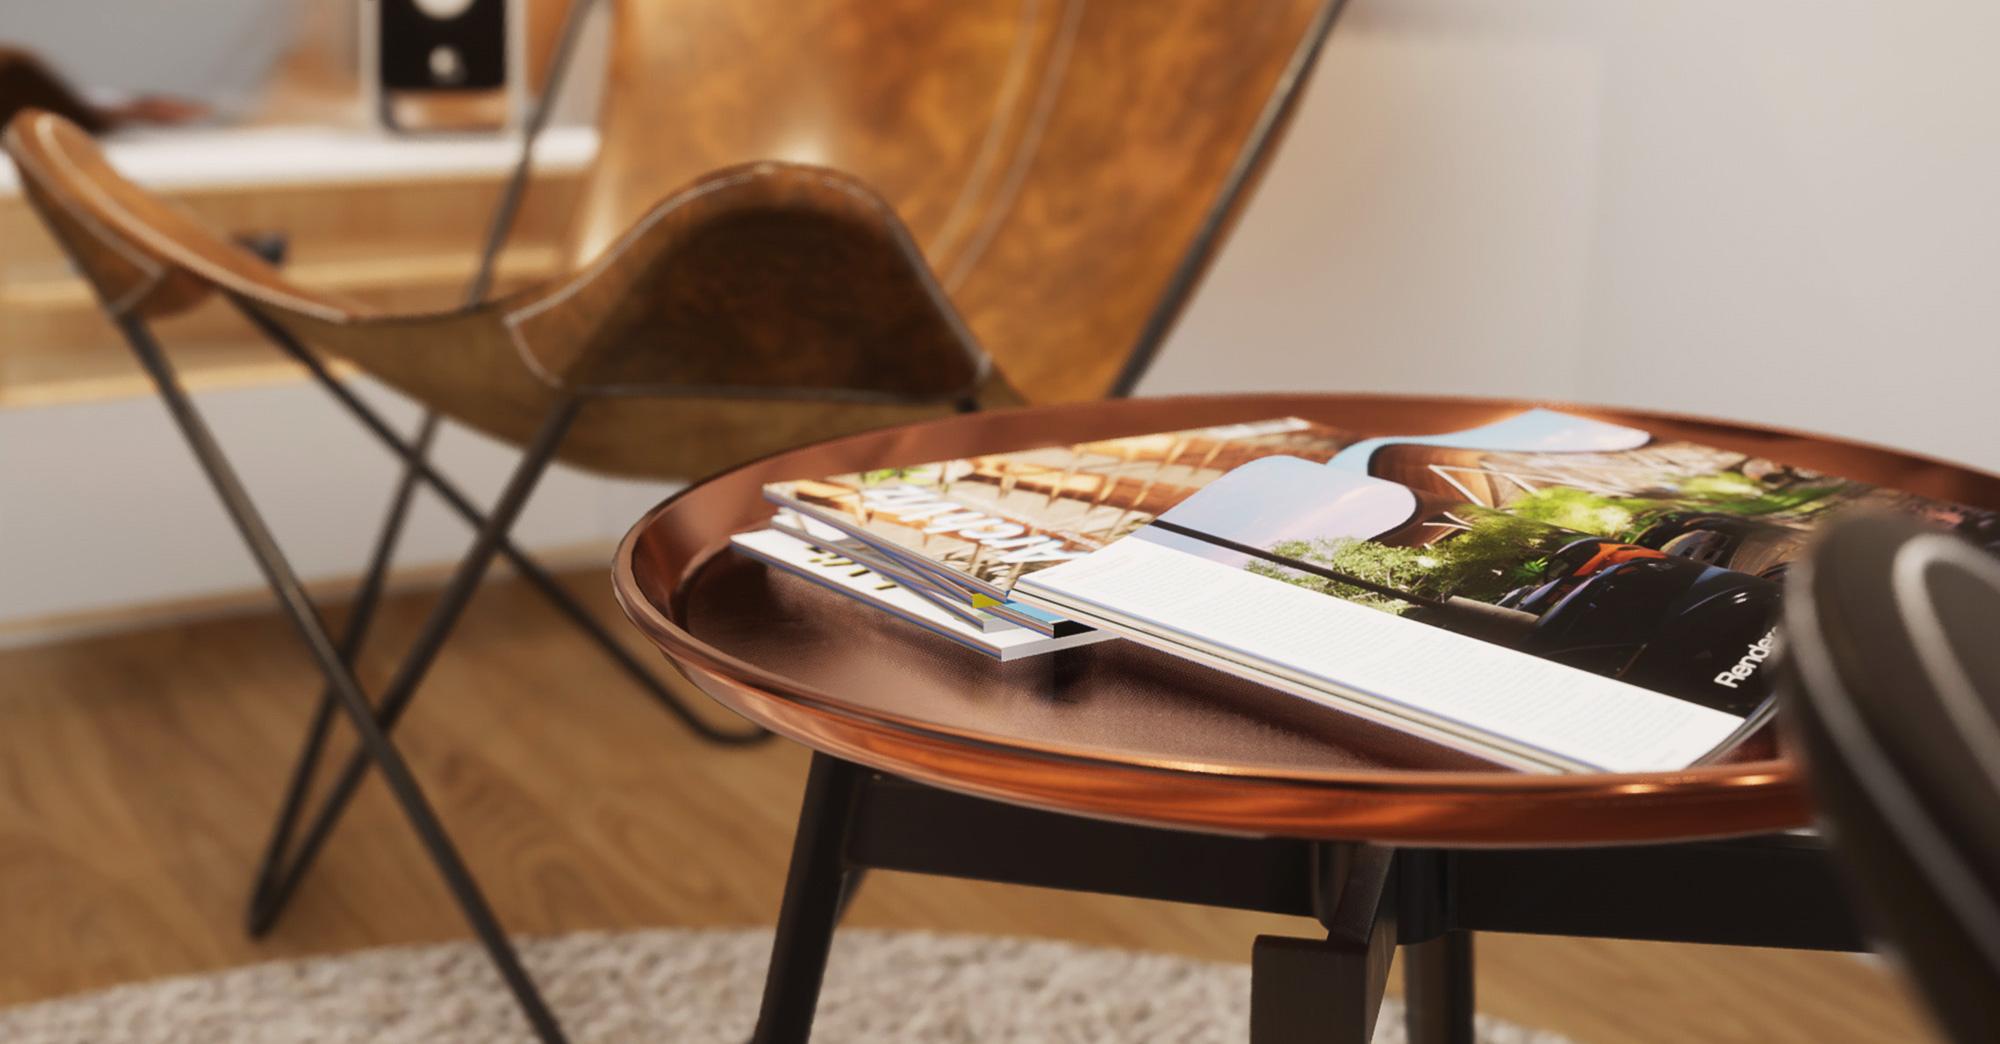 Interior design table close-up 室內設計 住宅設計 桌子 客廳